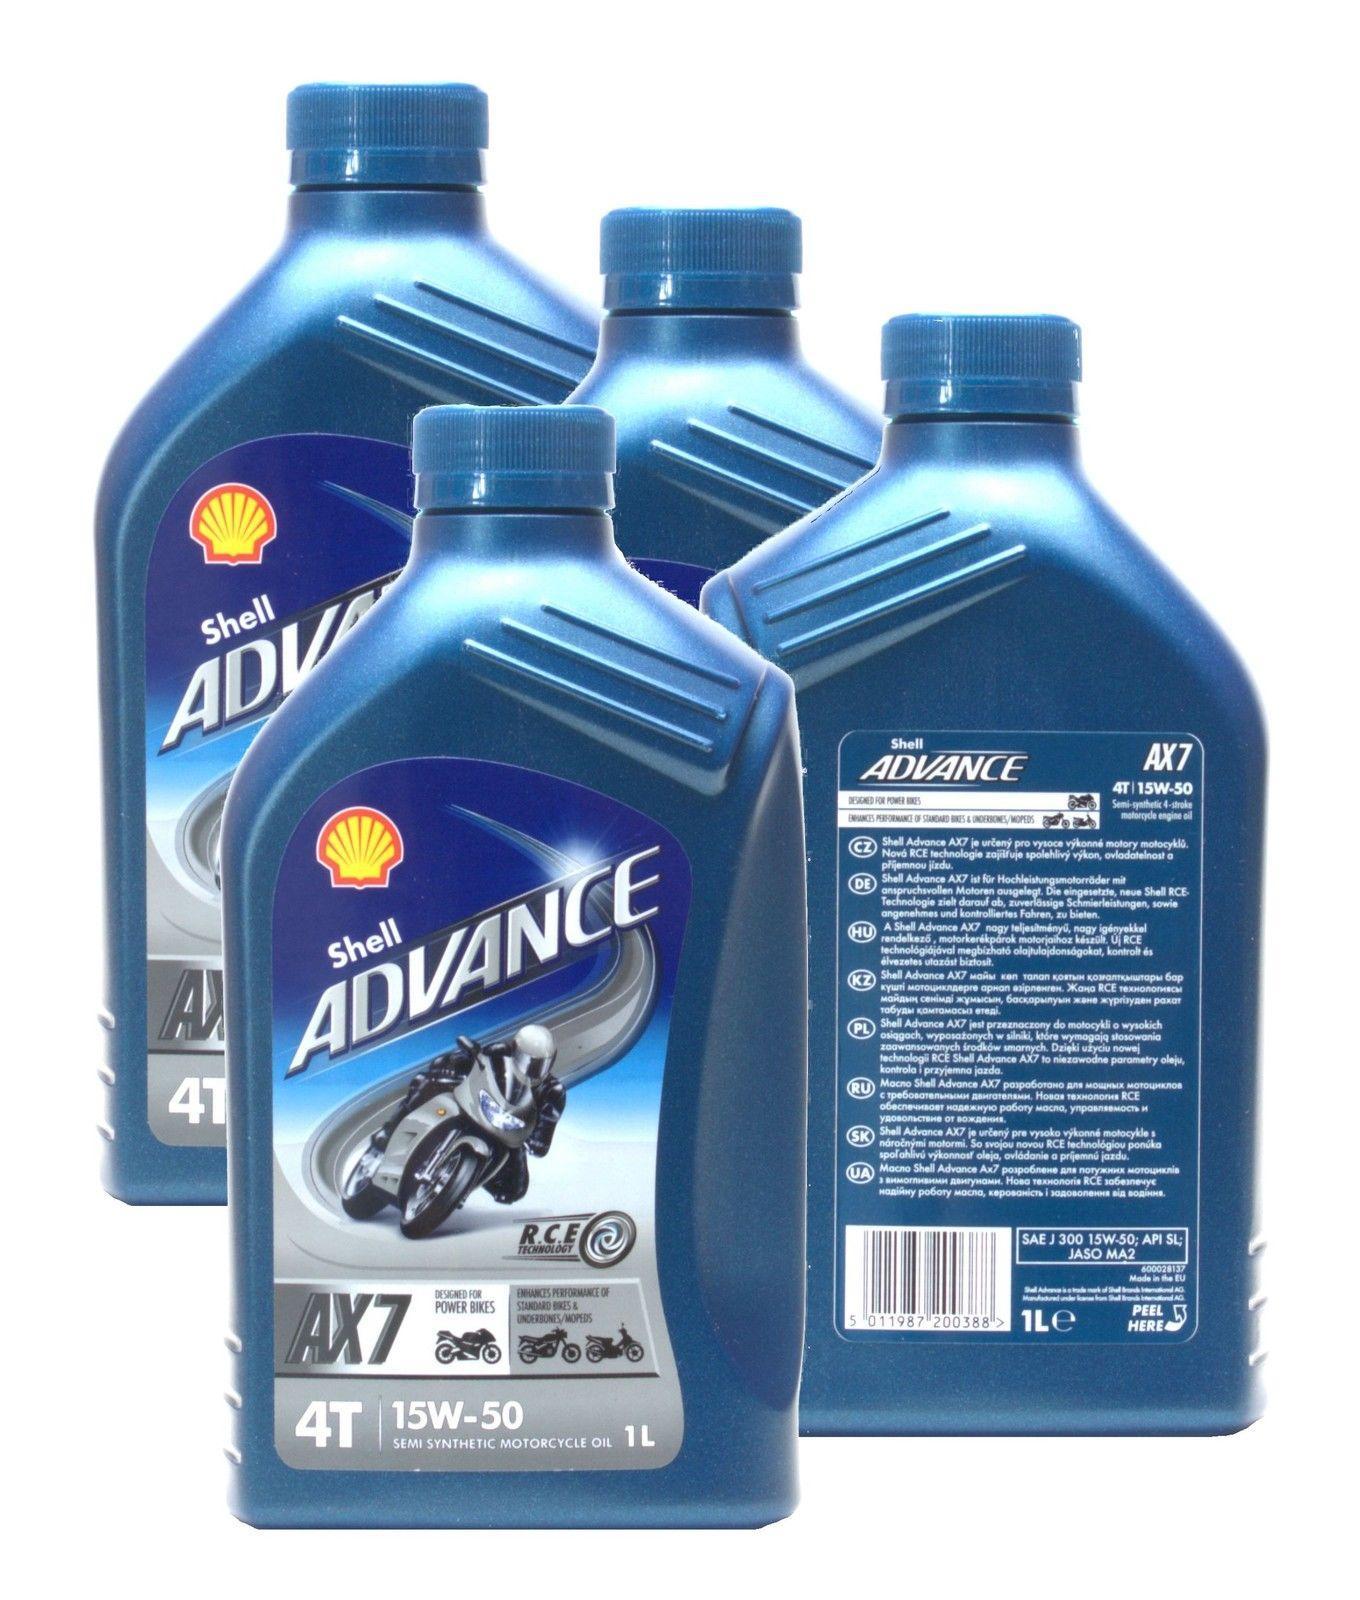 Shell Advance 4T AX7 15w/50 4x1 litro